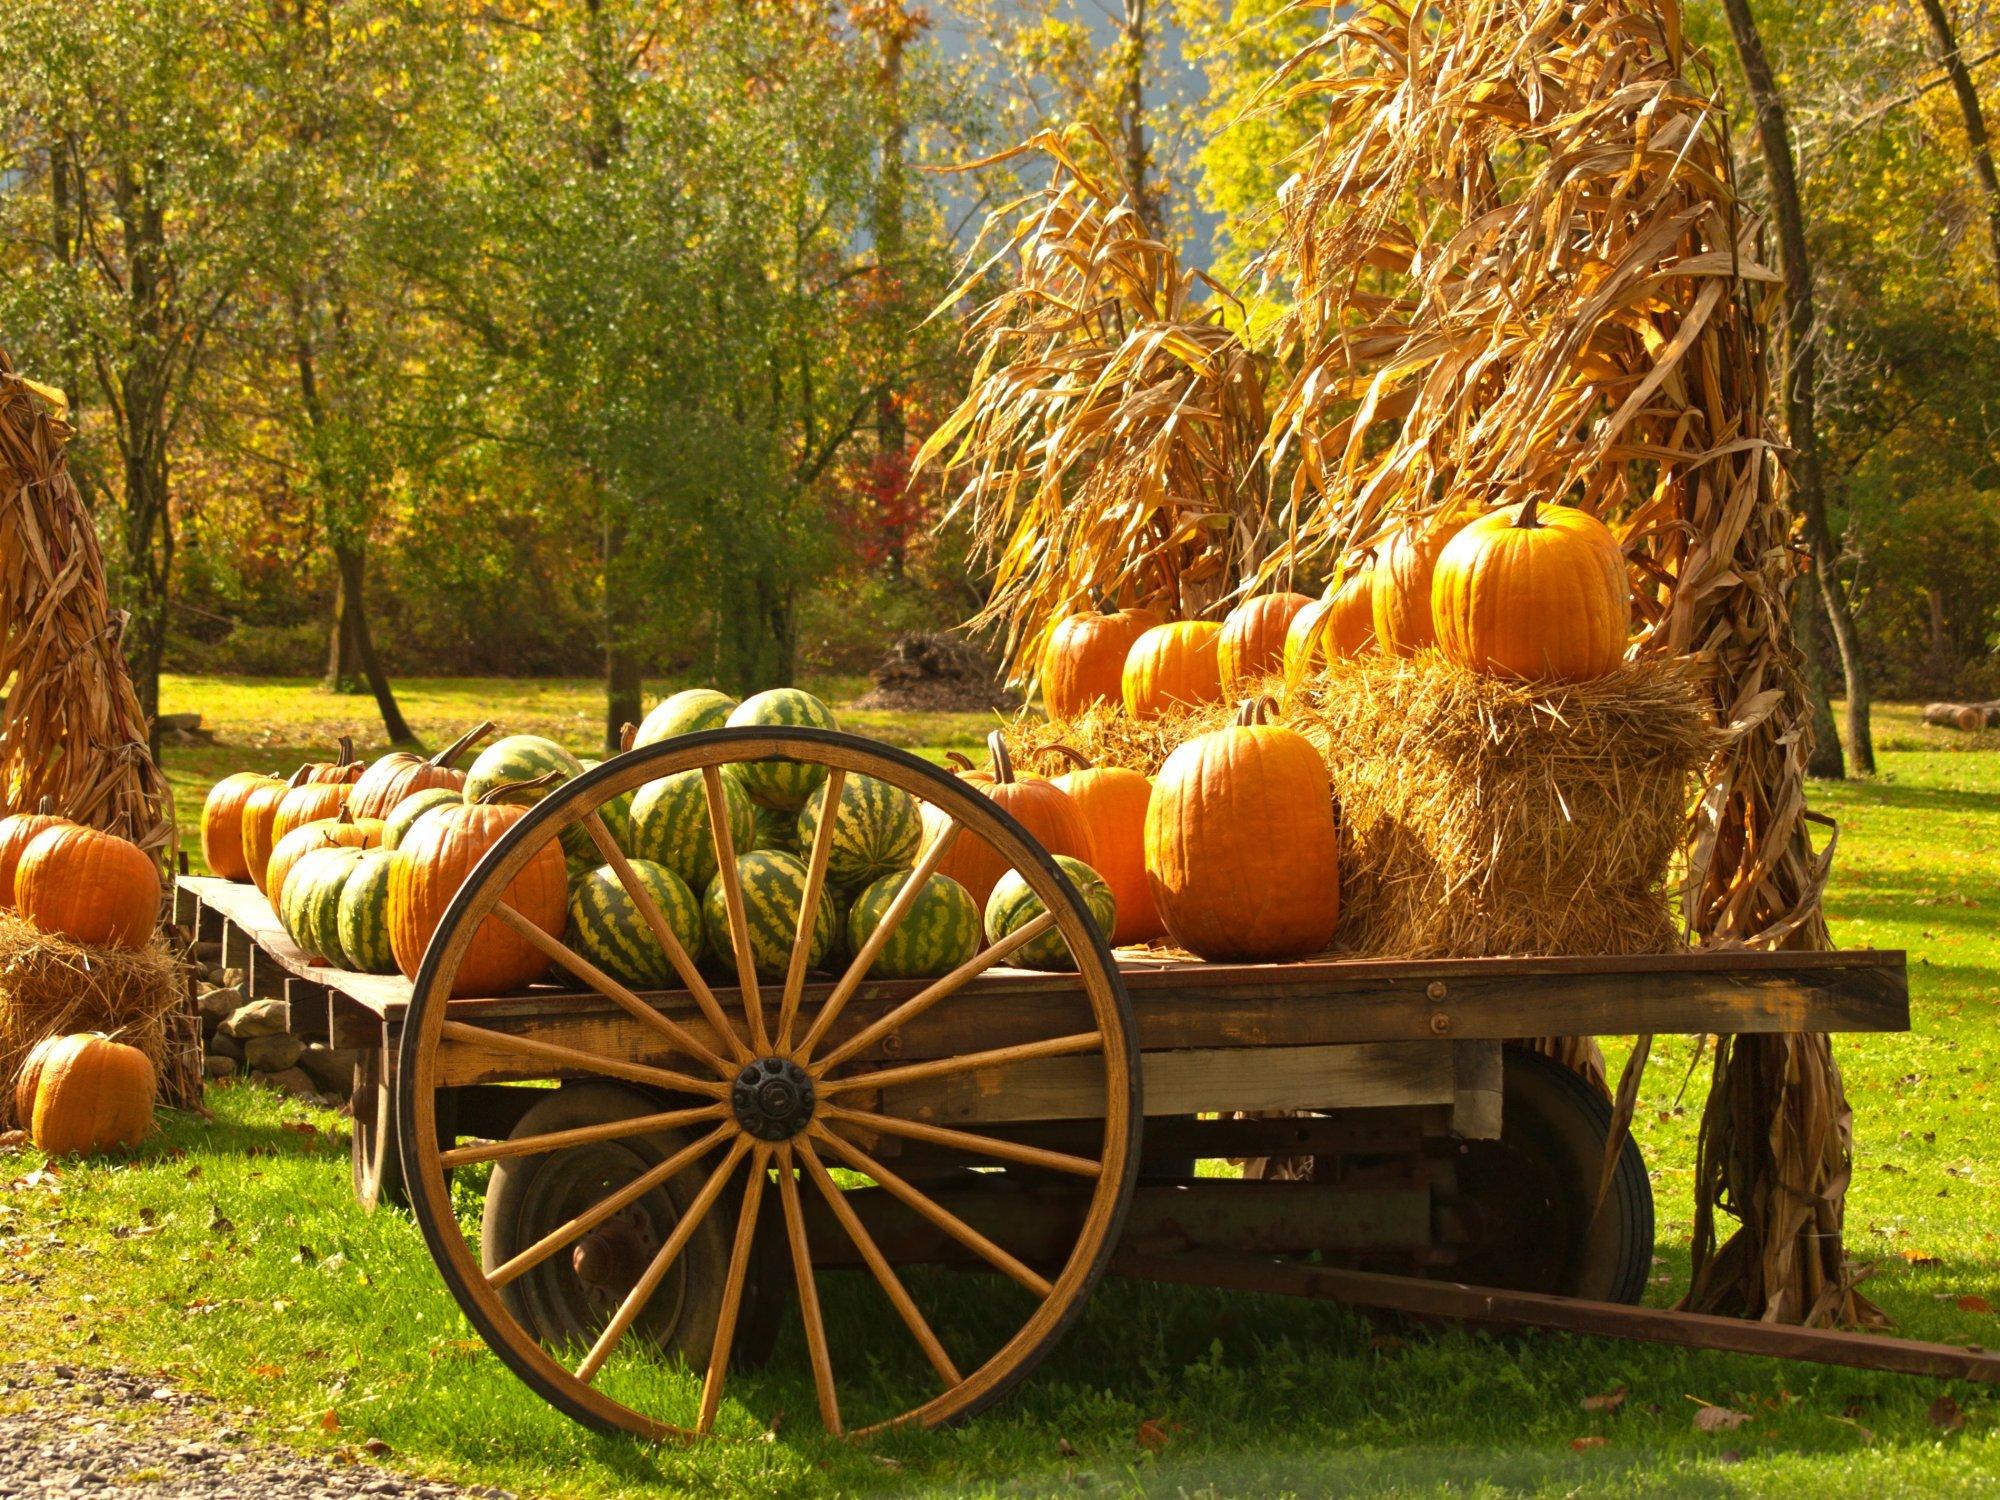 Scarecrow trail at huntsville botanical gardens 2018 - Huntsville botanical gardens hours ...